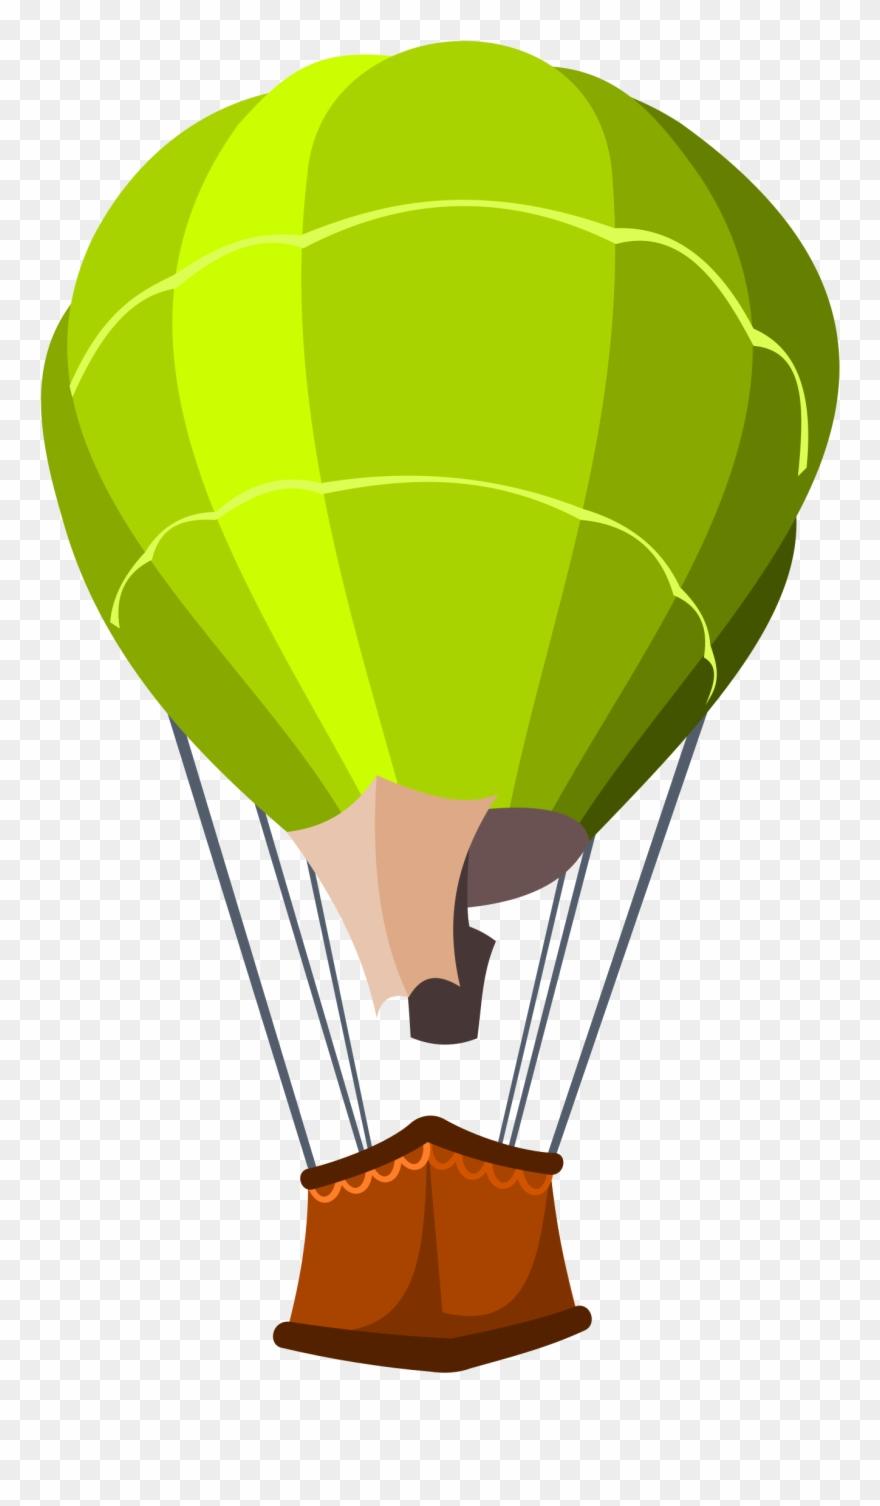 Hot Air Balloon Drawing Computer Icons Download.